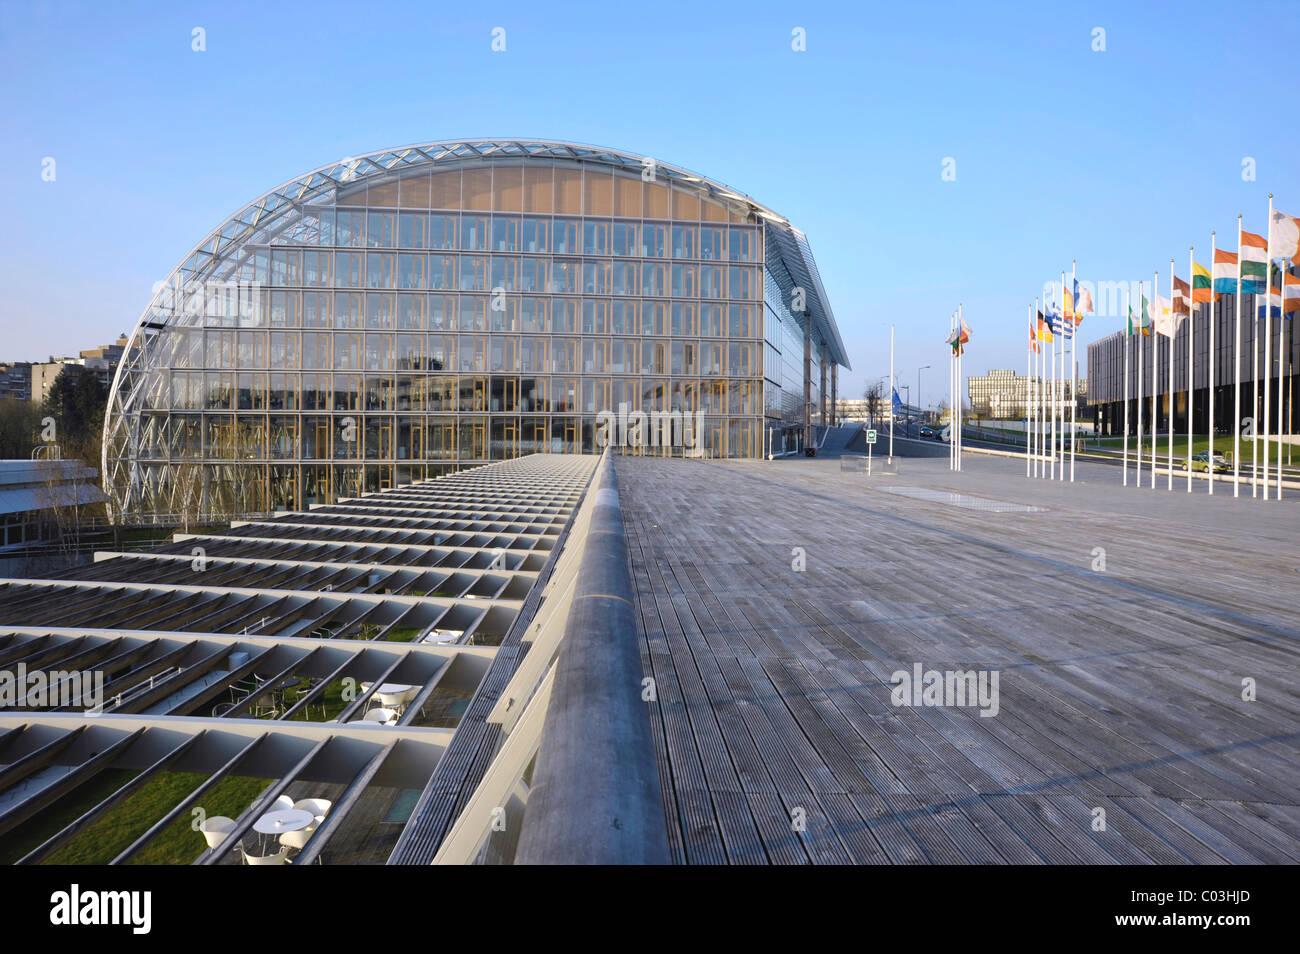 European Investment Bank, Boulevard Konrad Adenauer street, Kirchberg district, city of Luxembourg, Europe - Stock Image